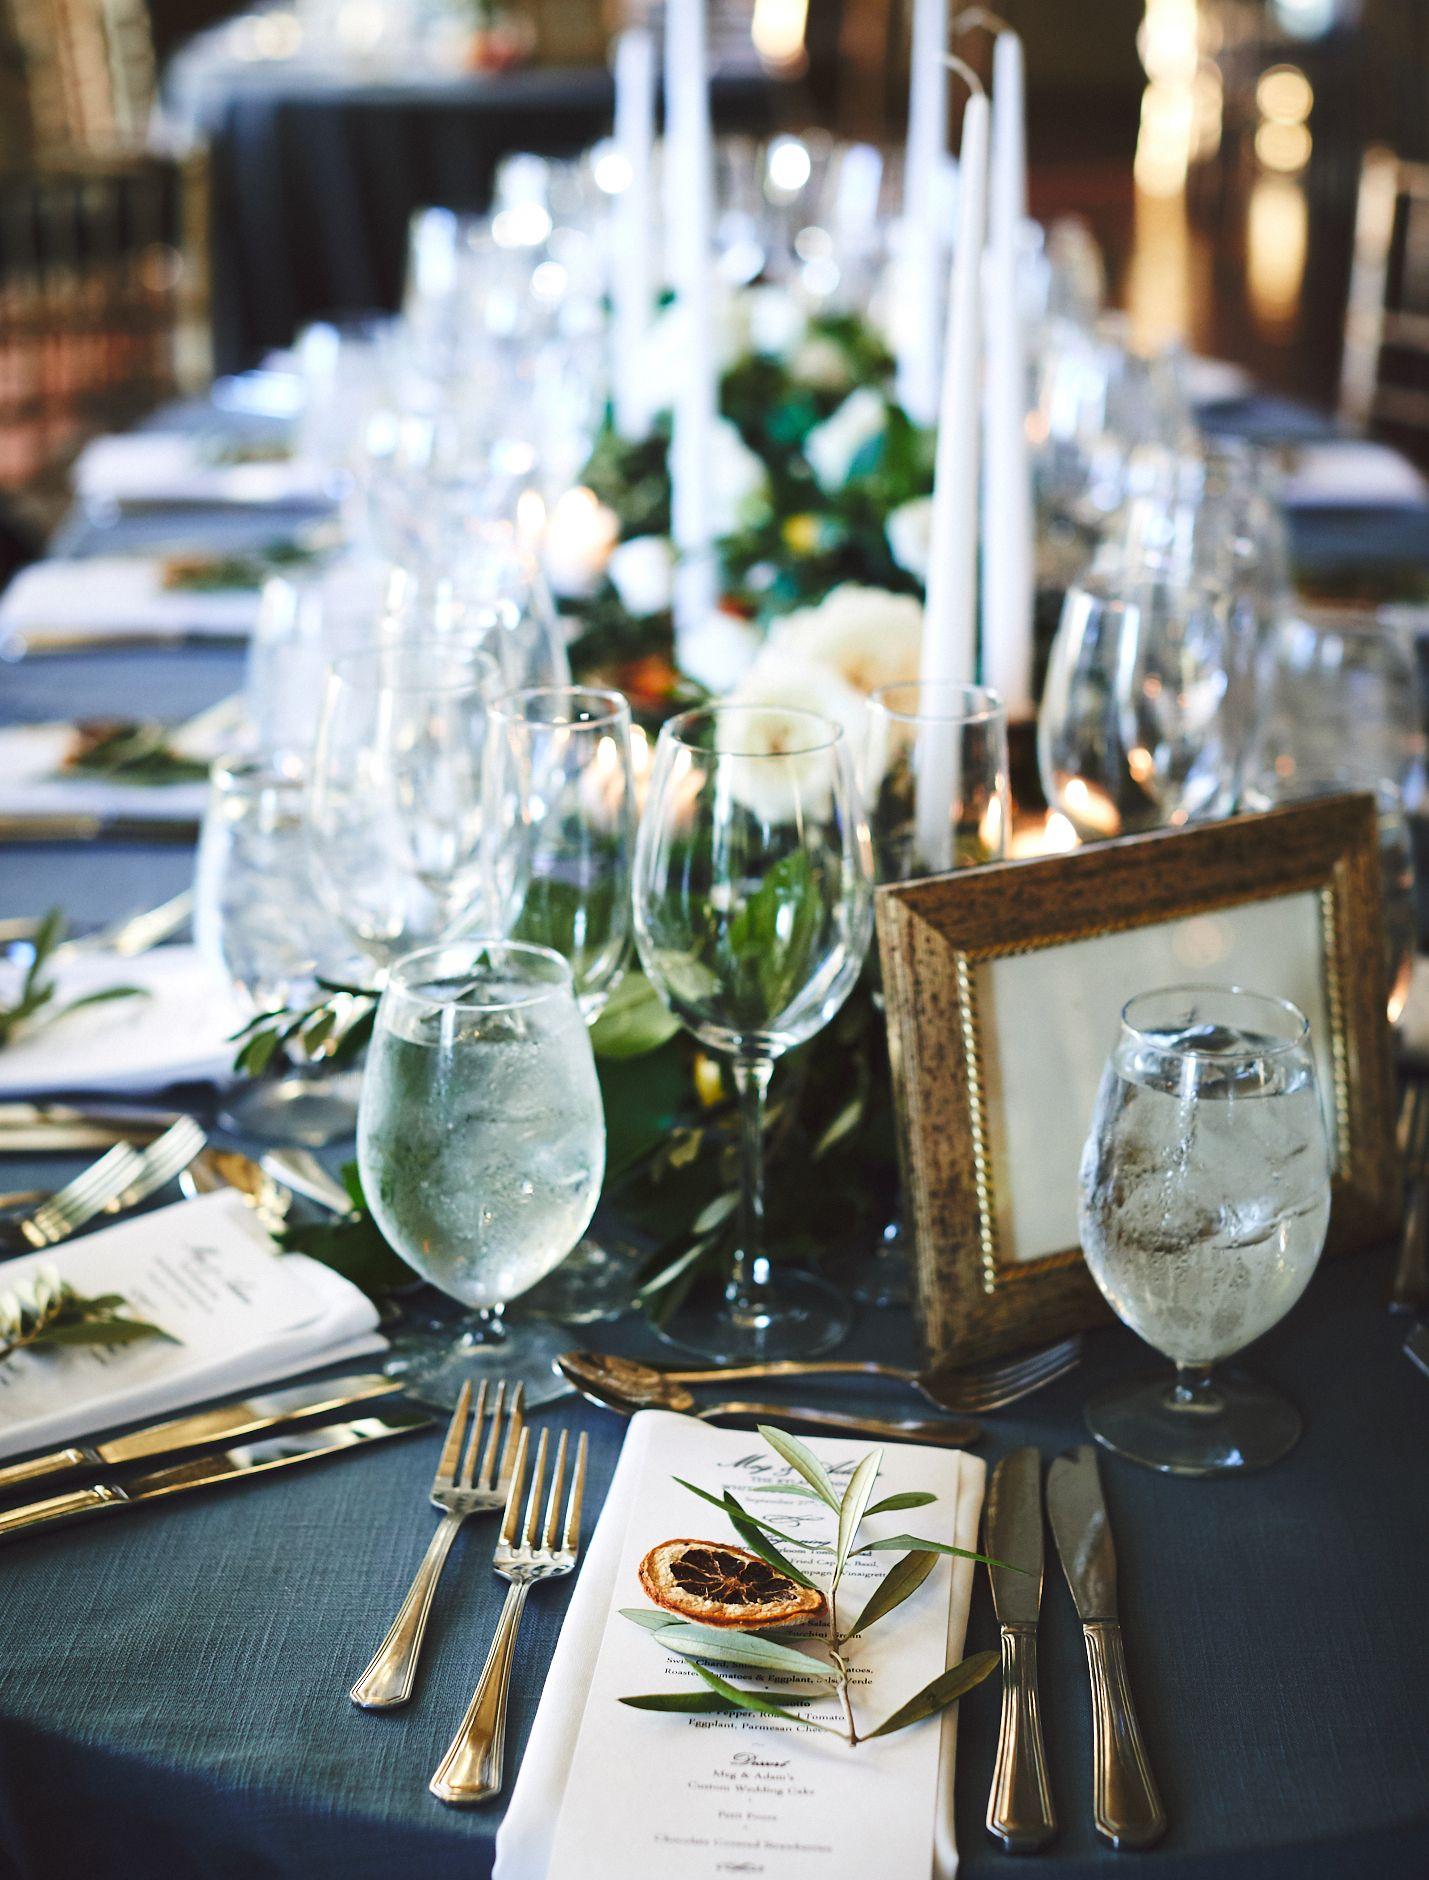 #fallwedding, #weddintable, #tabledecoration, #weddingideas, #weddingreceptionideas